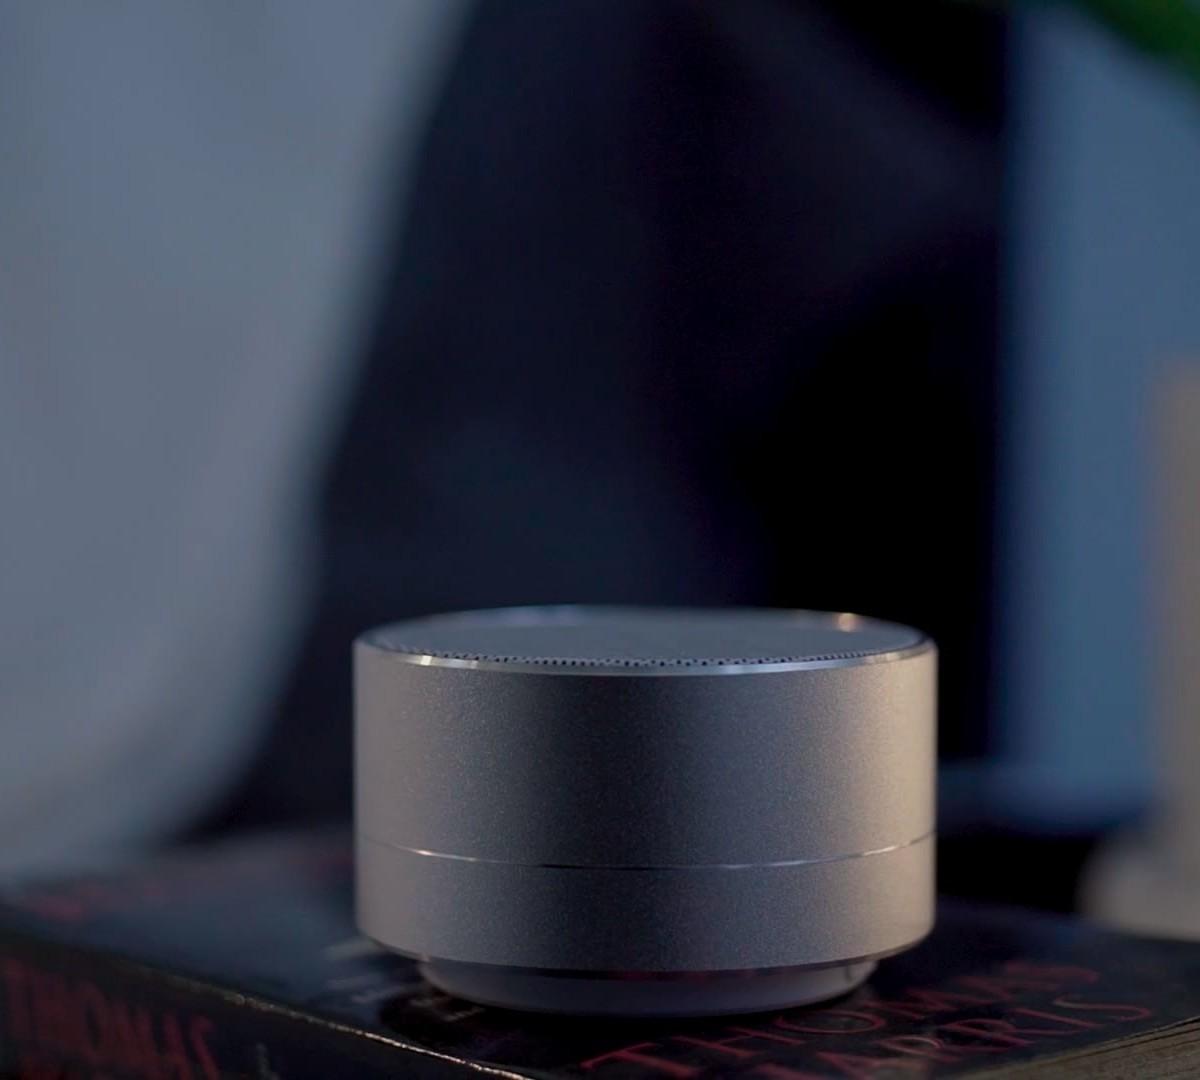 Banala Lite Sleep Cycle Inducing Device helps you fall into a deep sleep with just one push